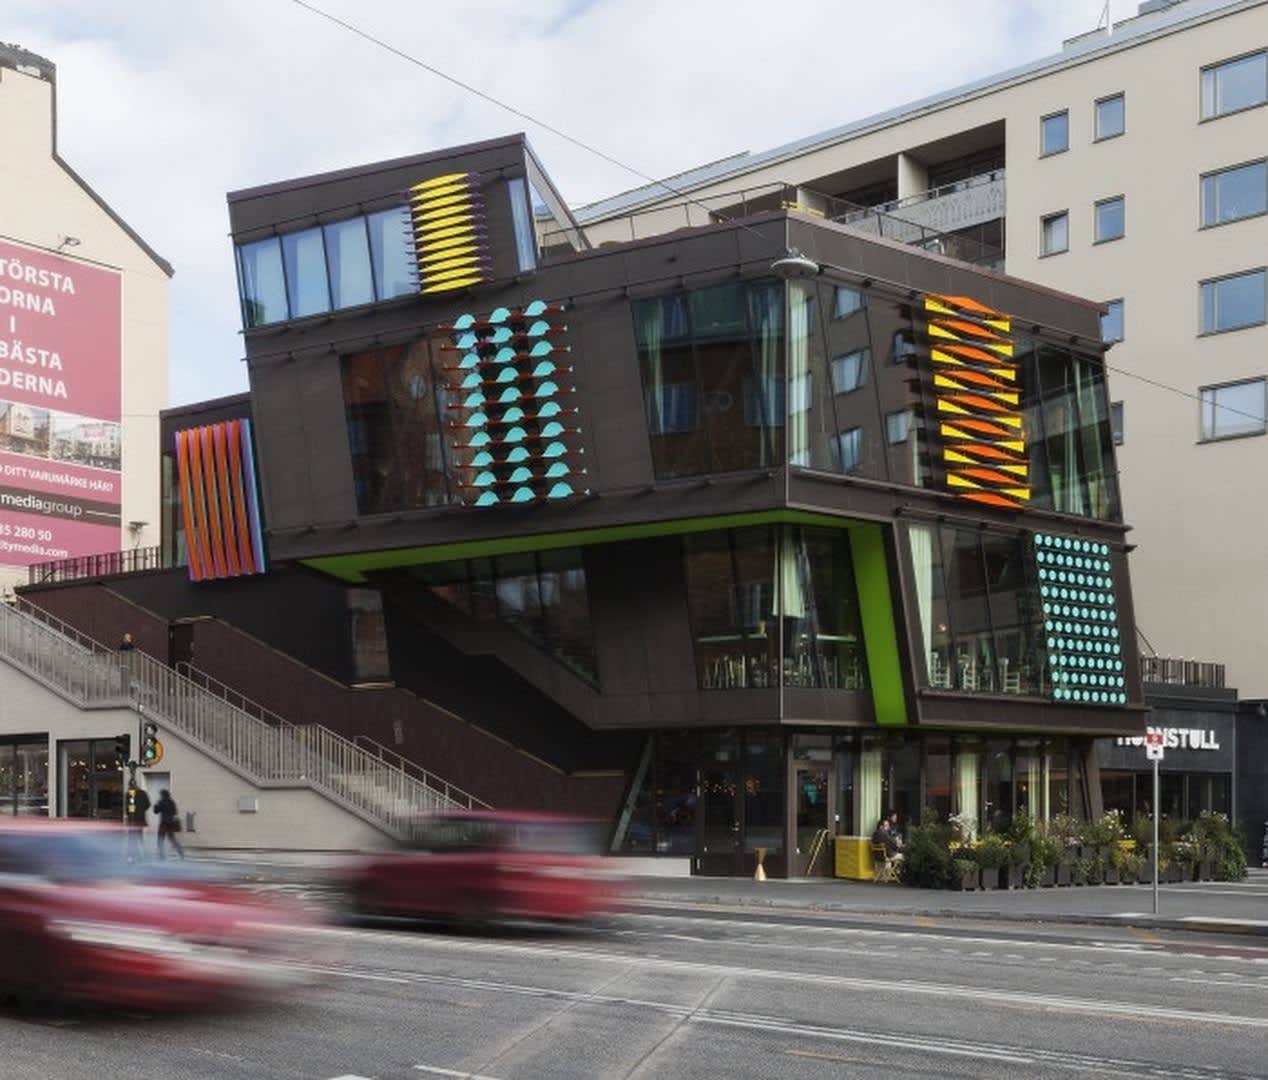 Jacob Dahlgren Permanent installation in Hornstull, Stockholm, Sweden, 2013